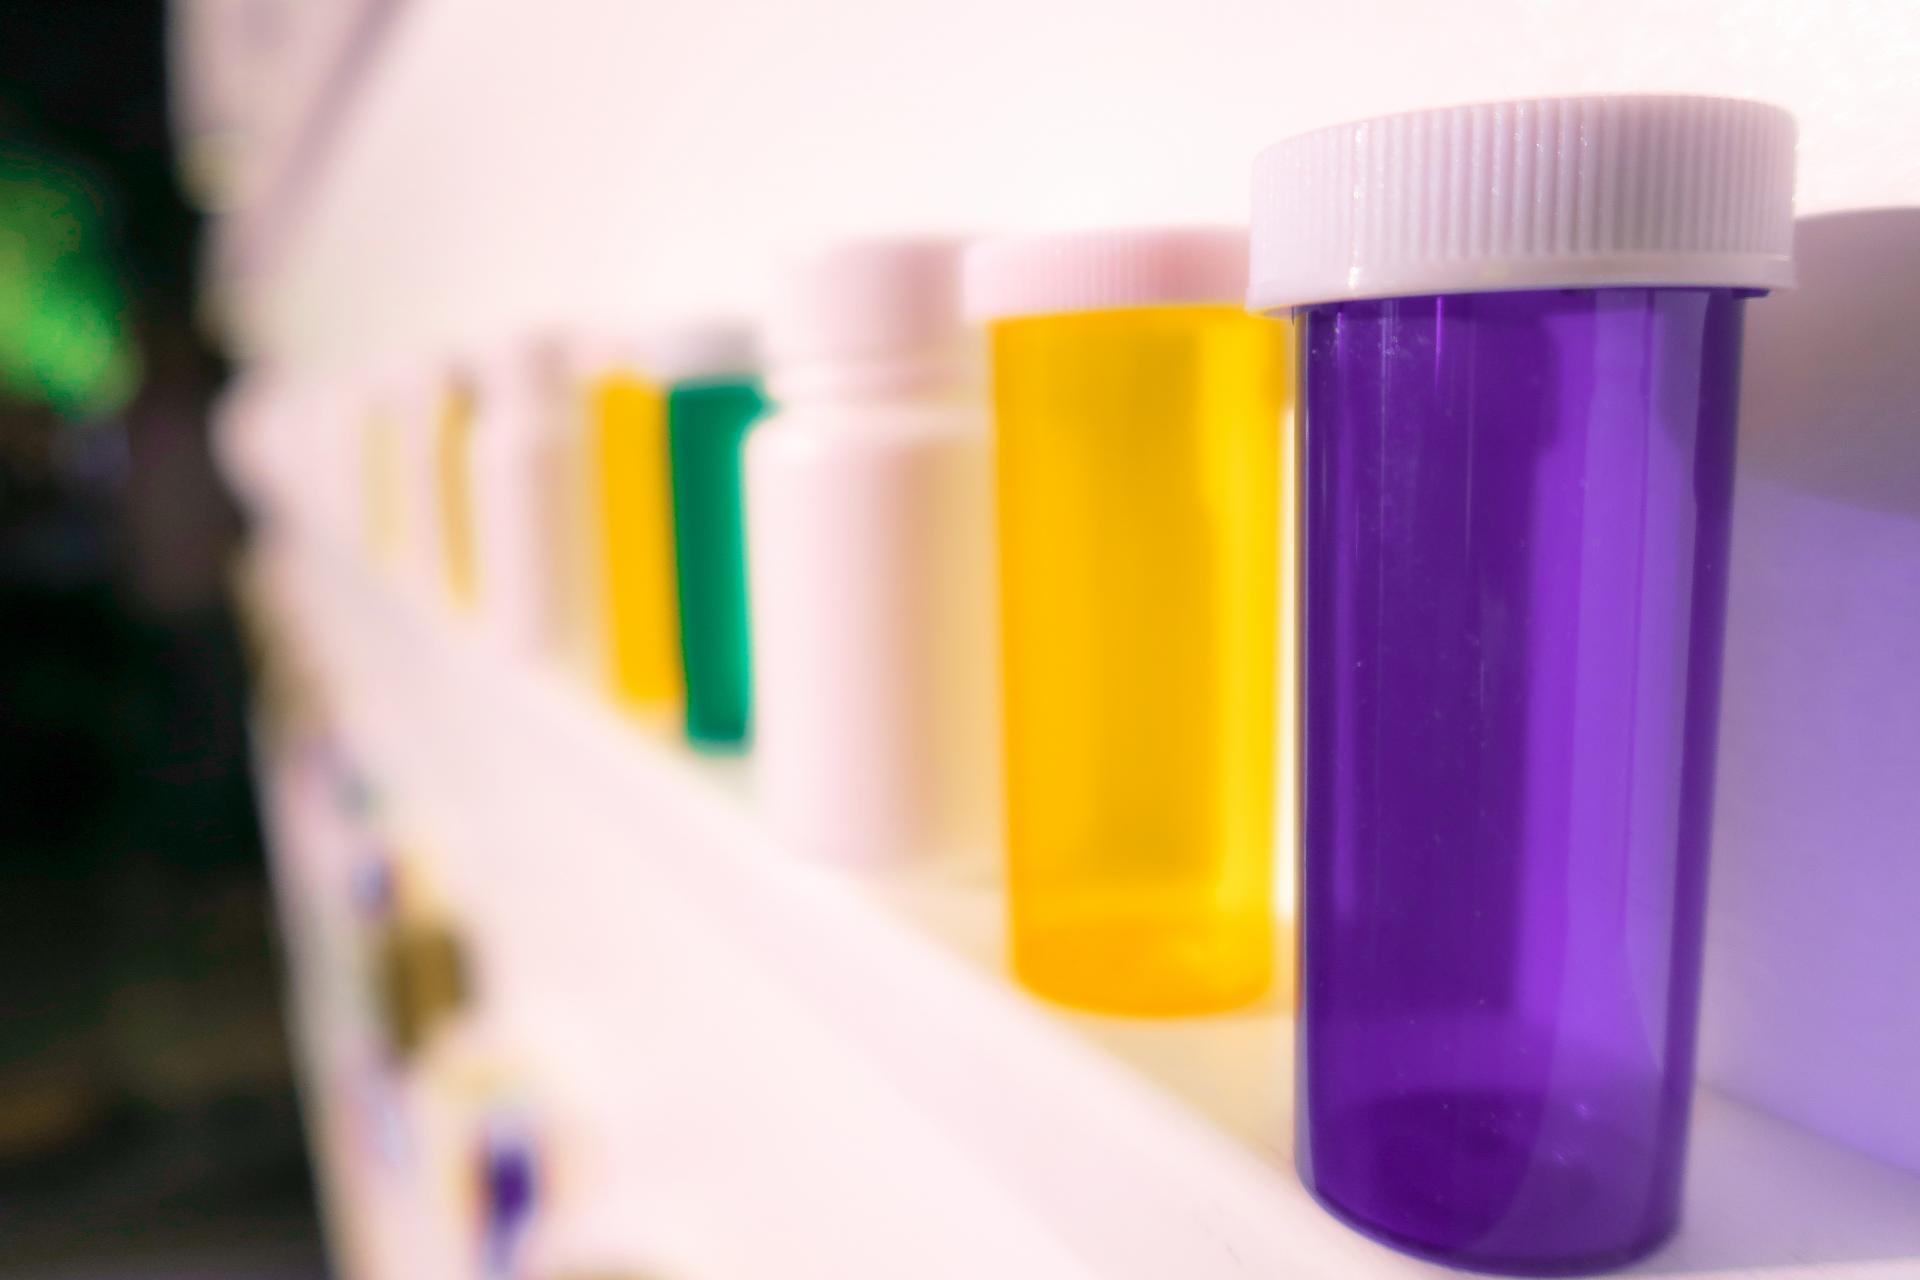 pharmacy pots on a shelf